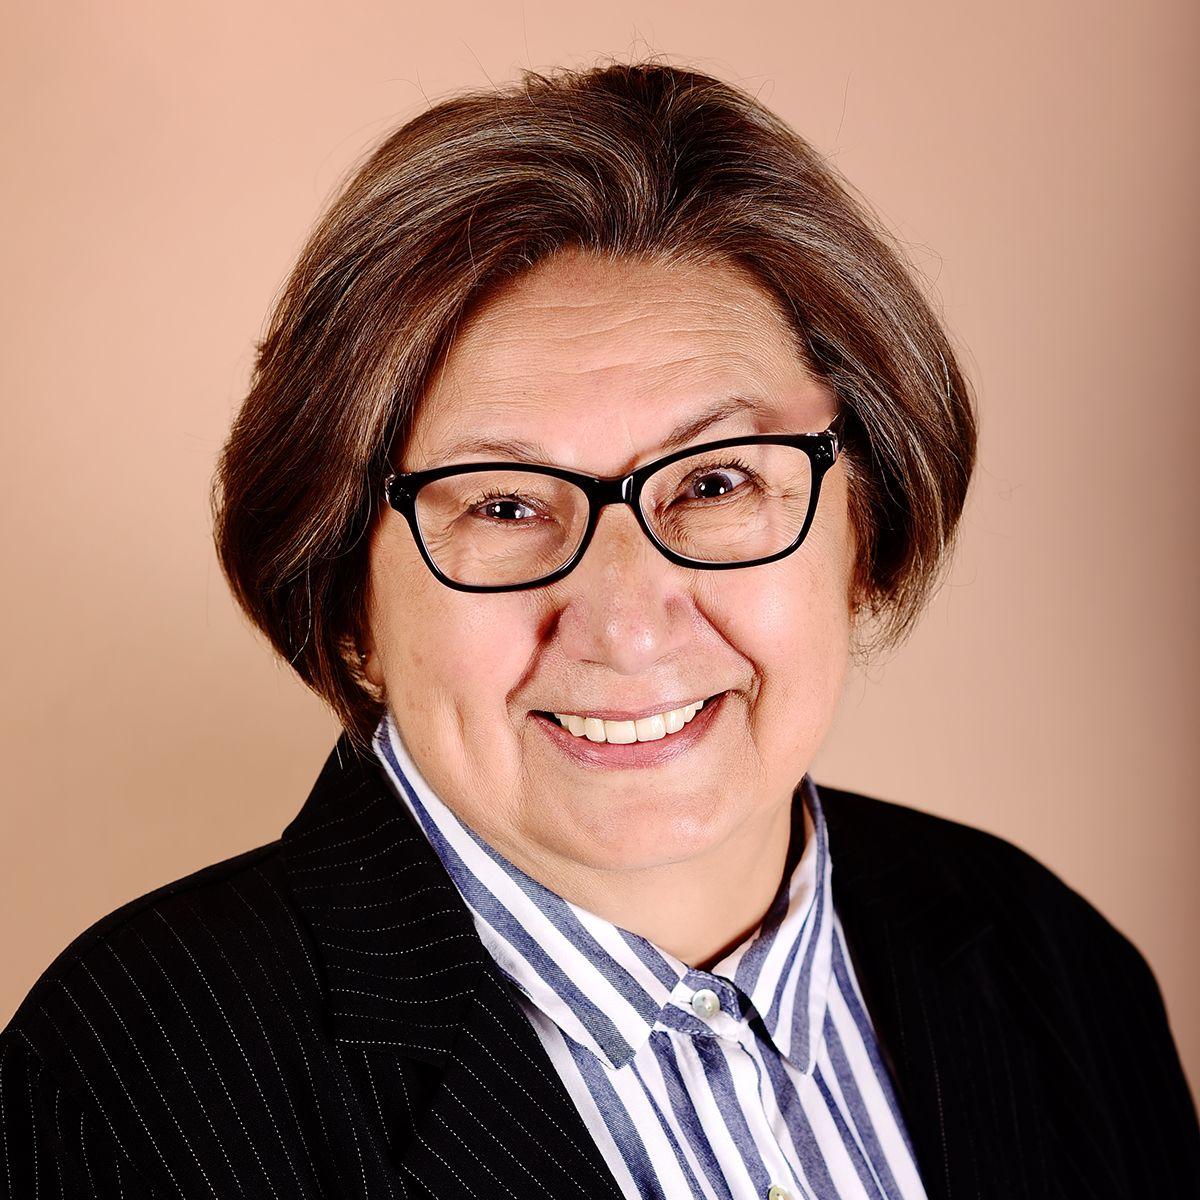 Mrs. Olinda Sherman